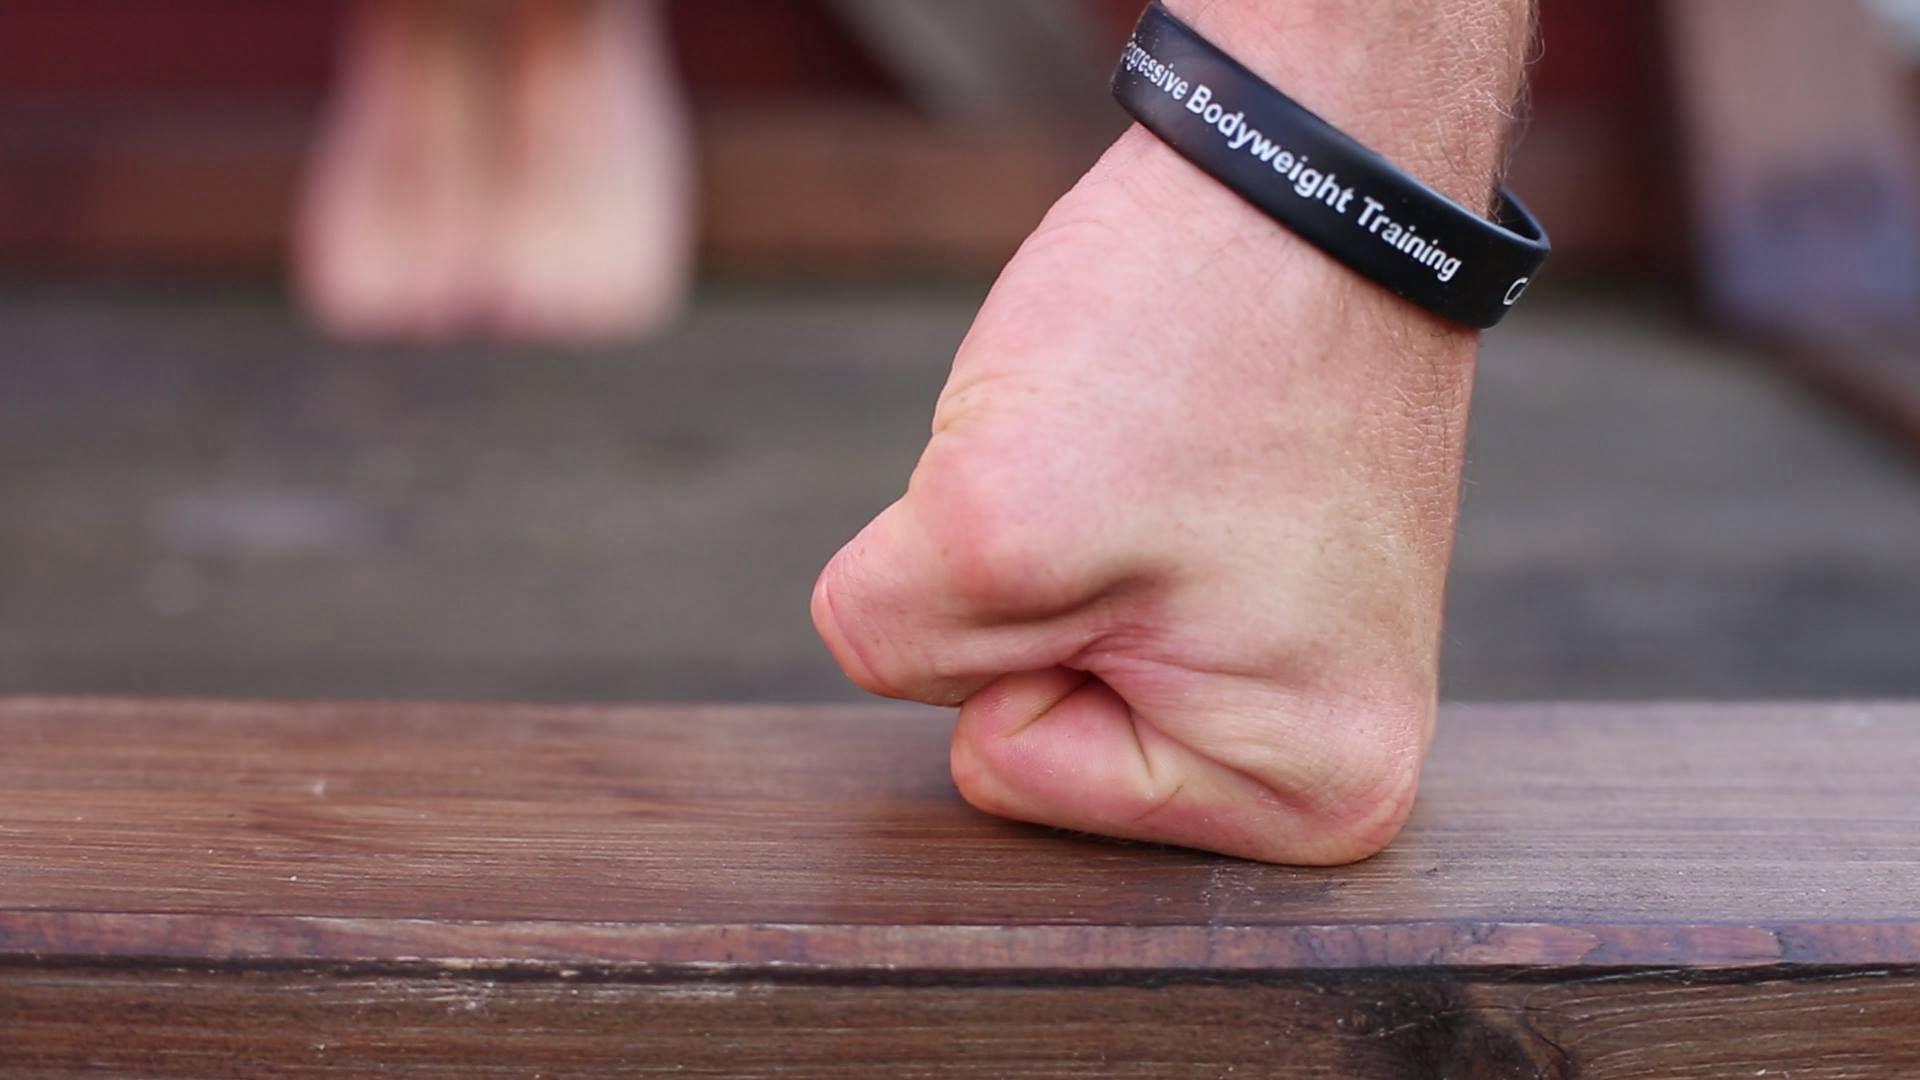 Badminton Tips Wrist Strength